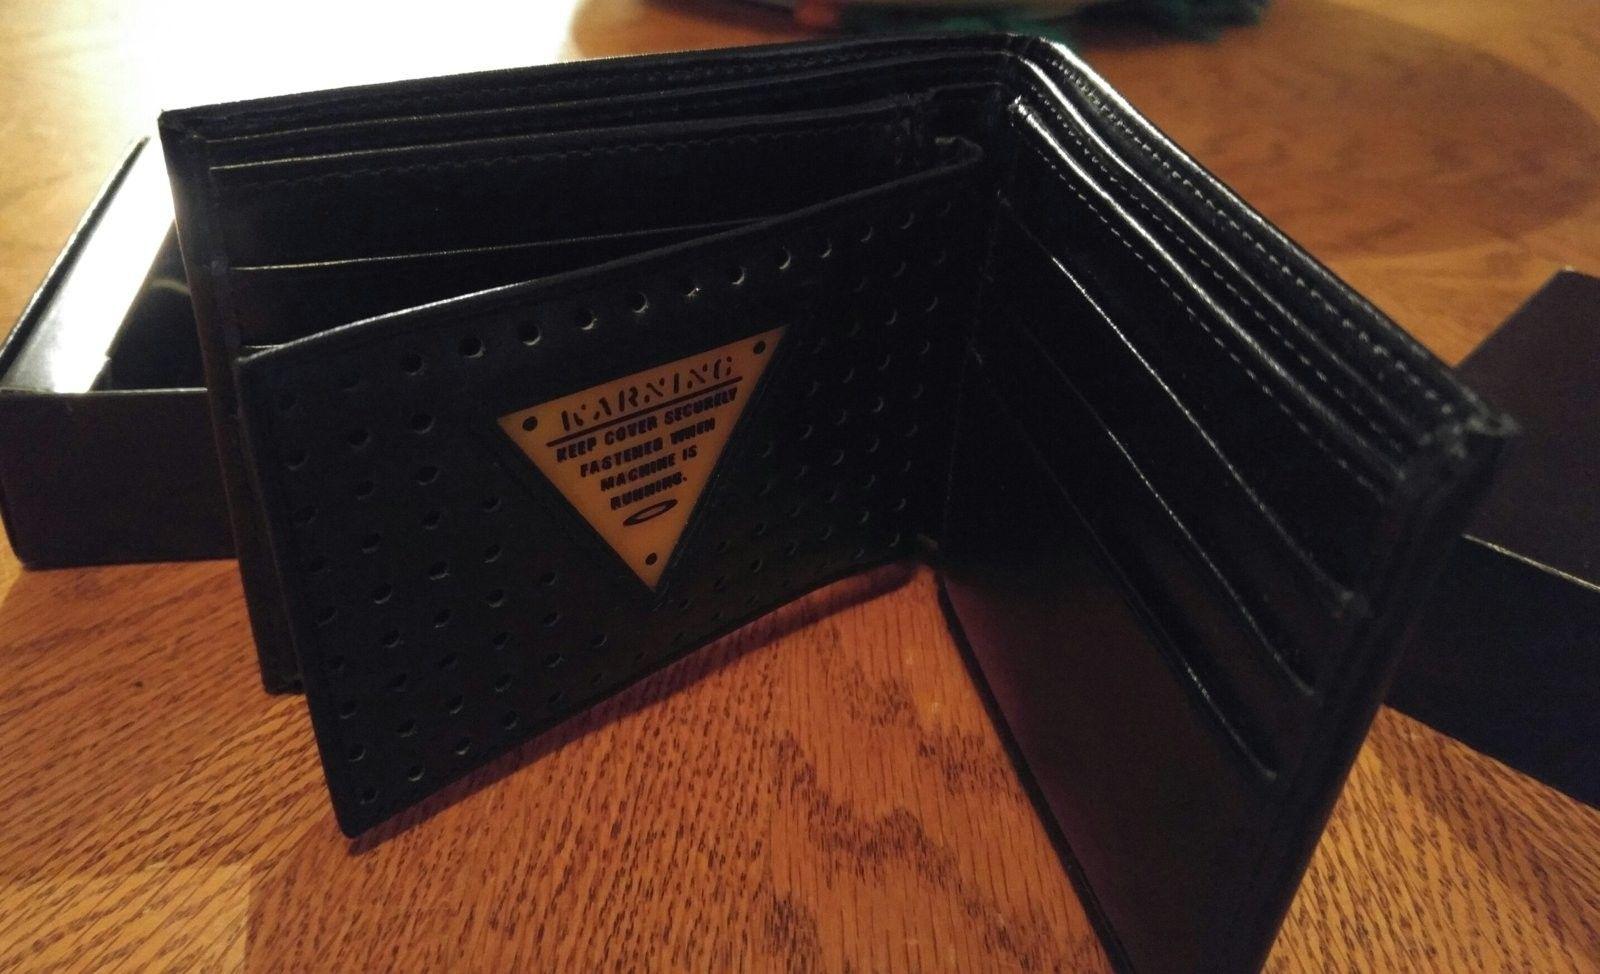 Bnib black leather wallet and bottle opener - 20160412_111535-1.jpg